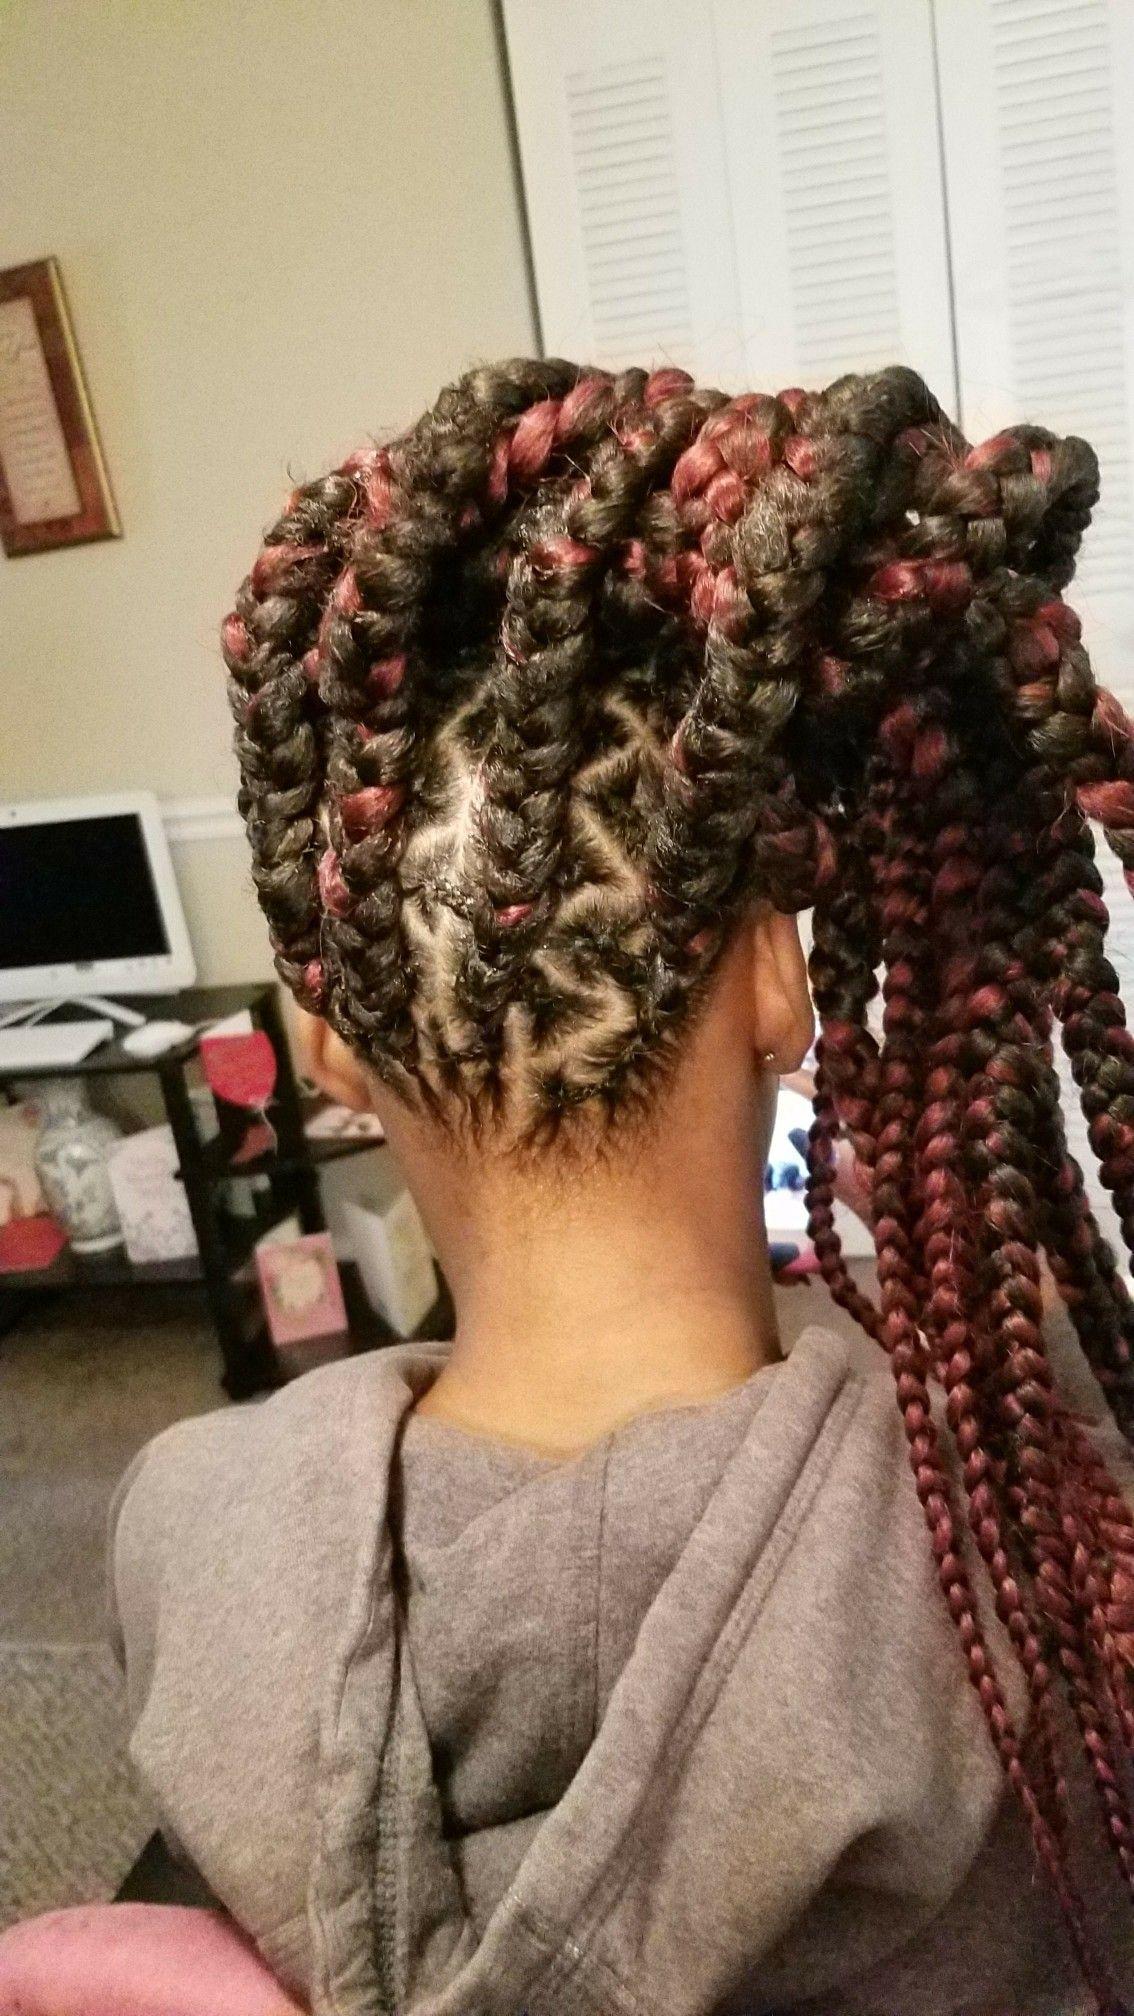 3 19 18 Finished my goddaughter Jazmyne s hair team natural